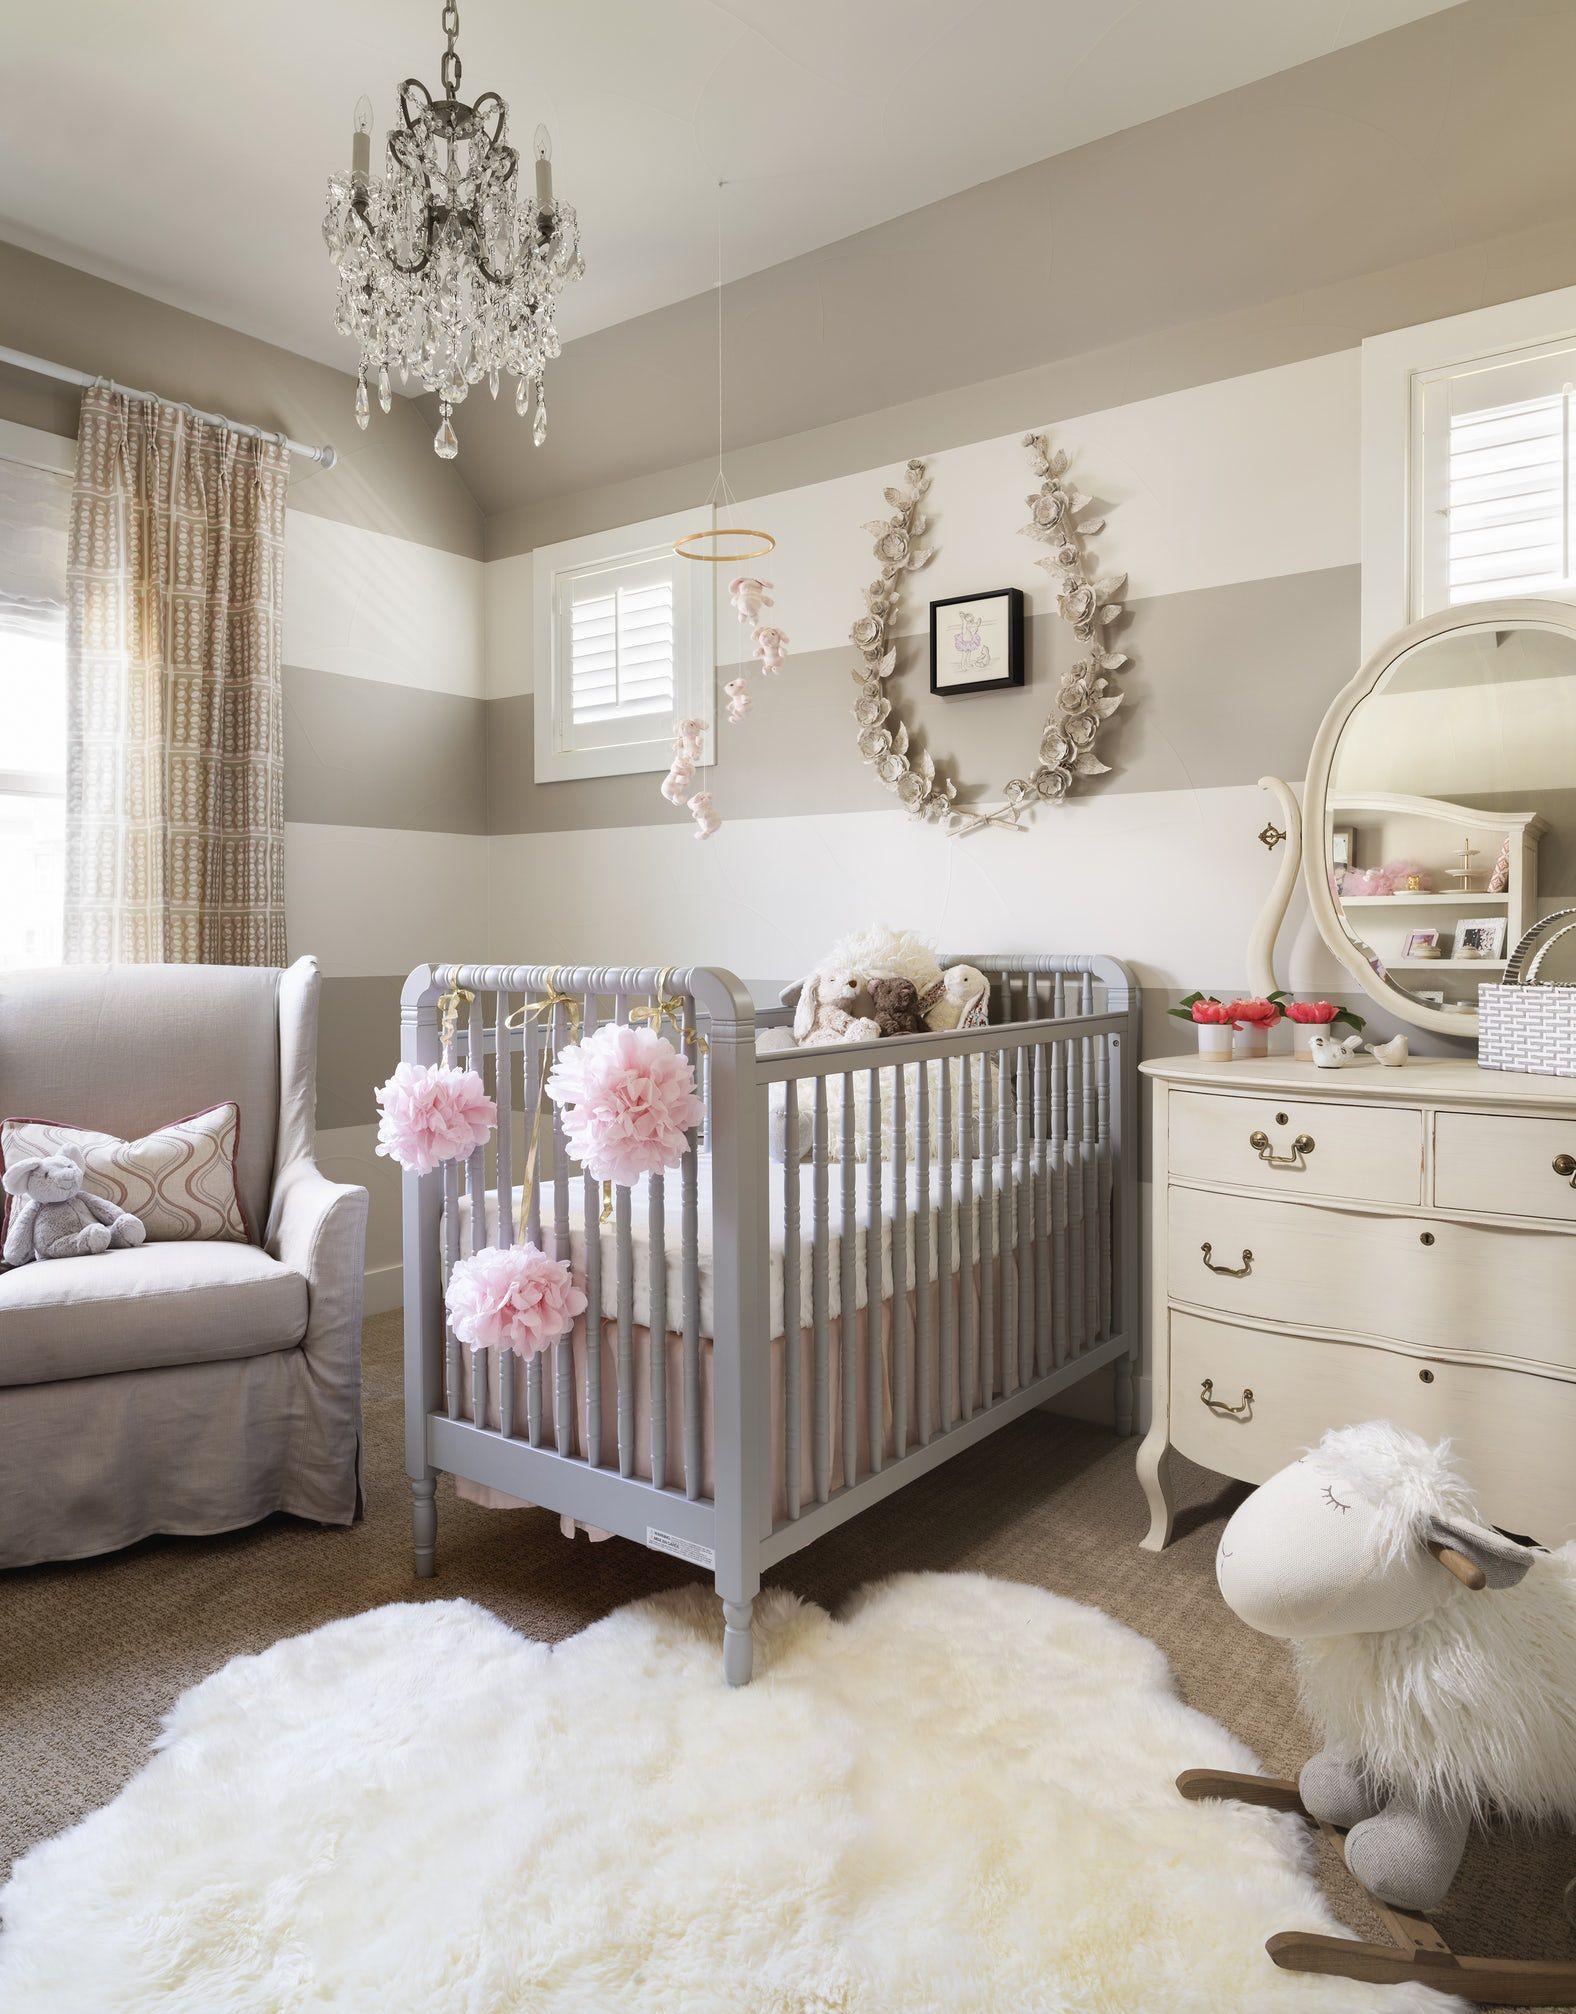 Chic Baby Room Design Ideas